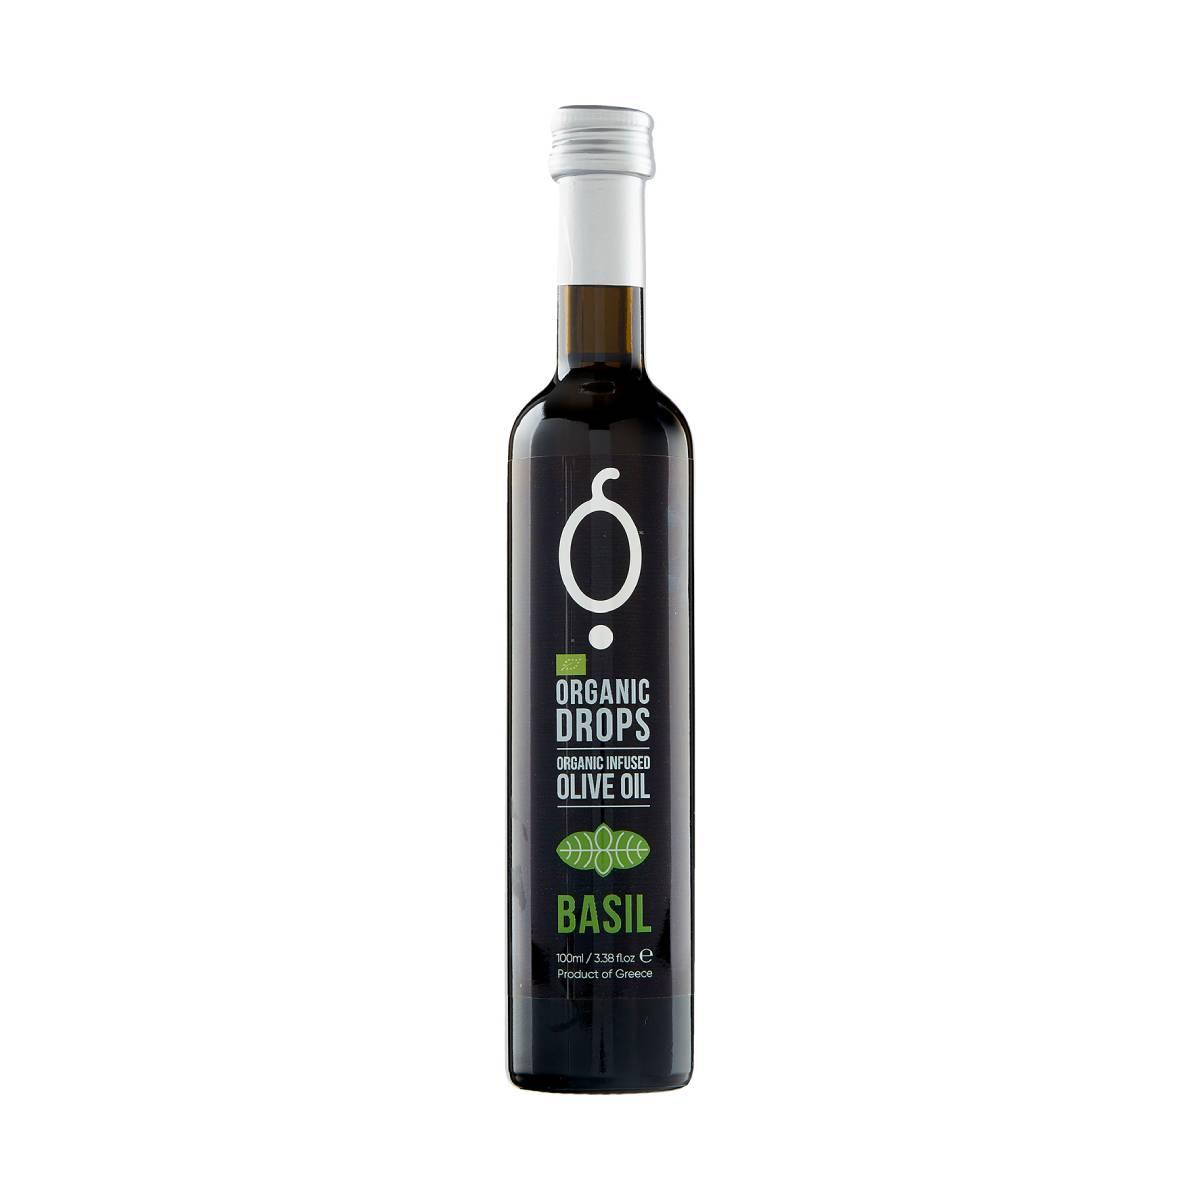 Organic Drops Basil Organic Olive Oil